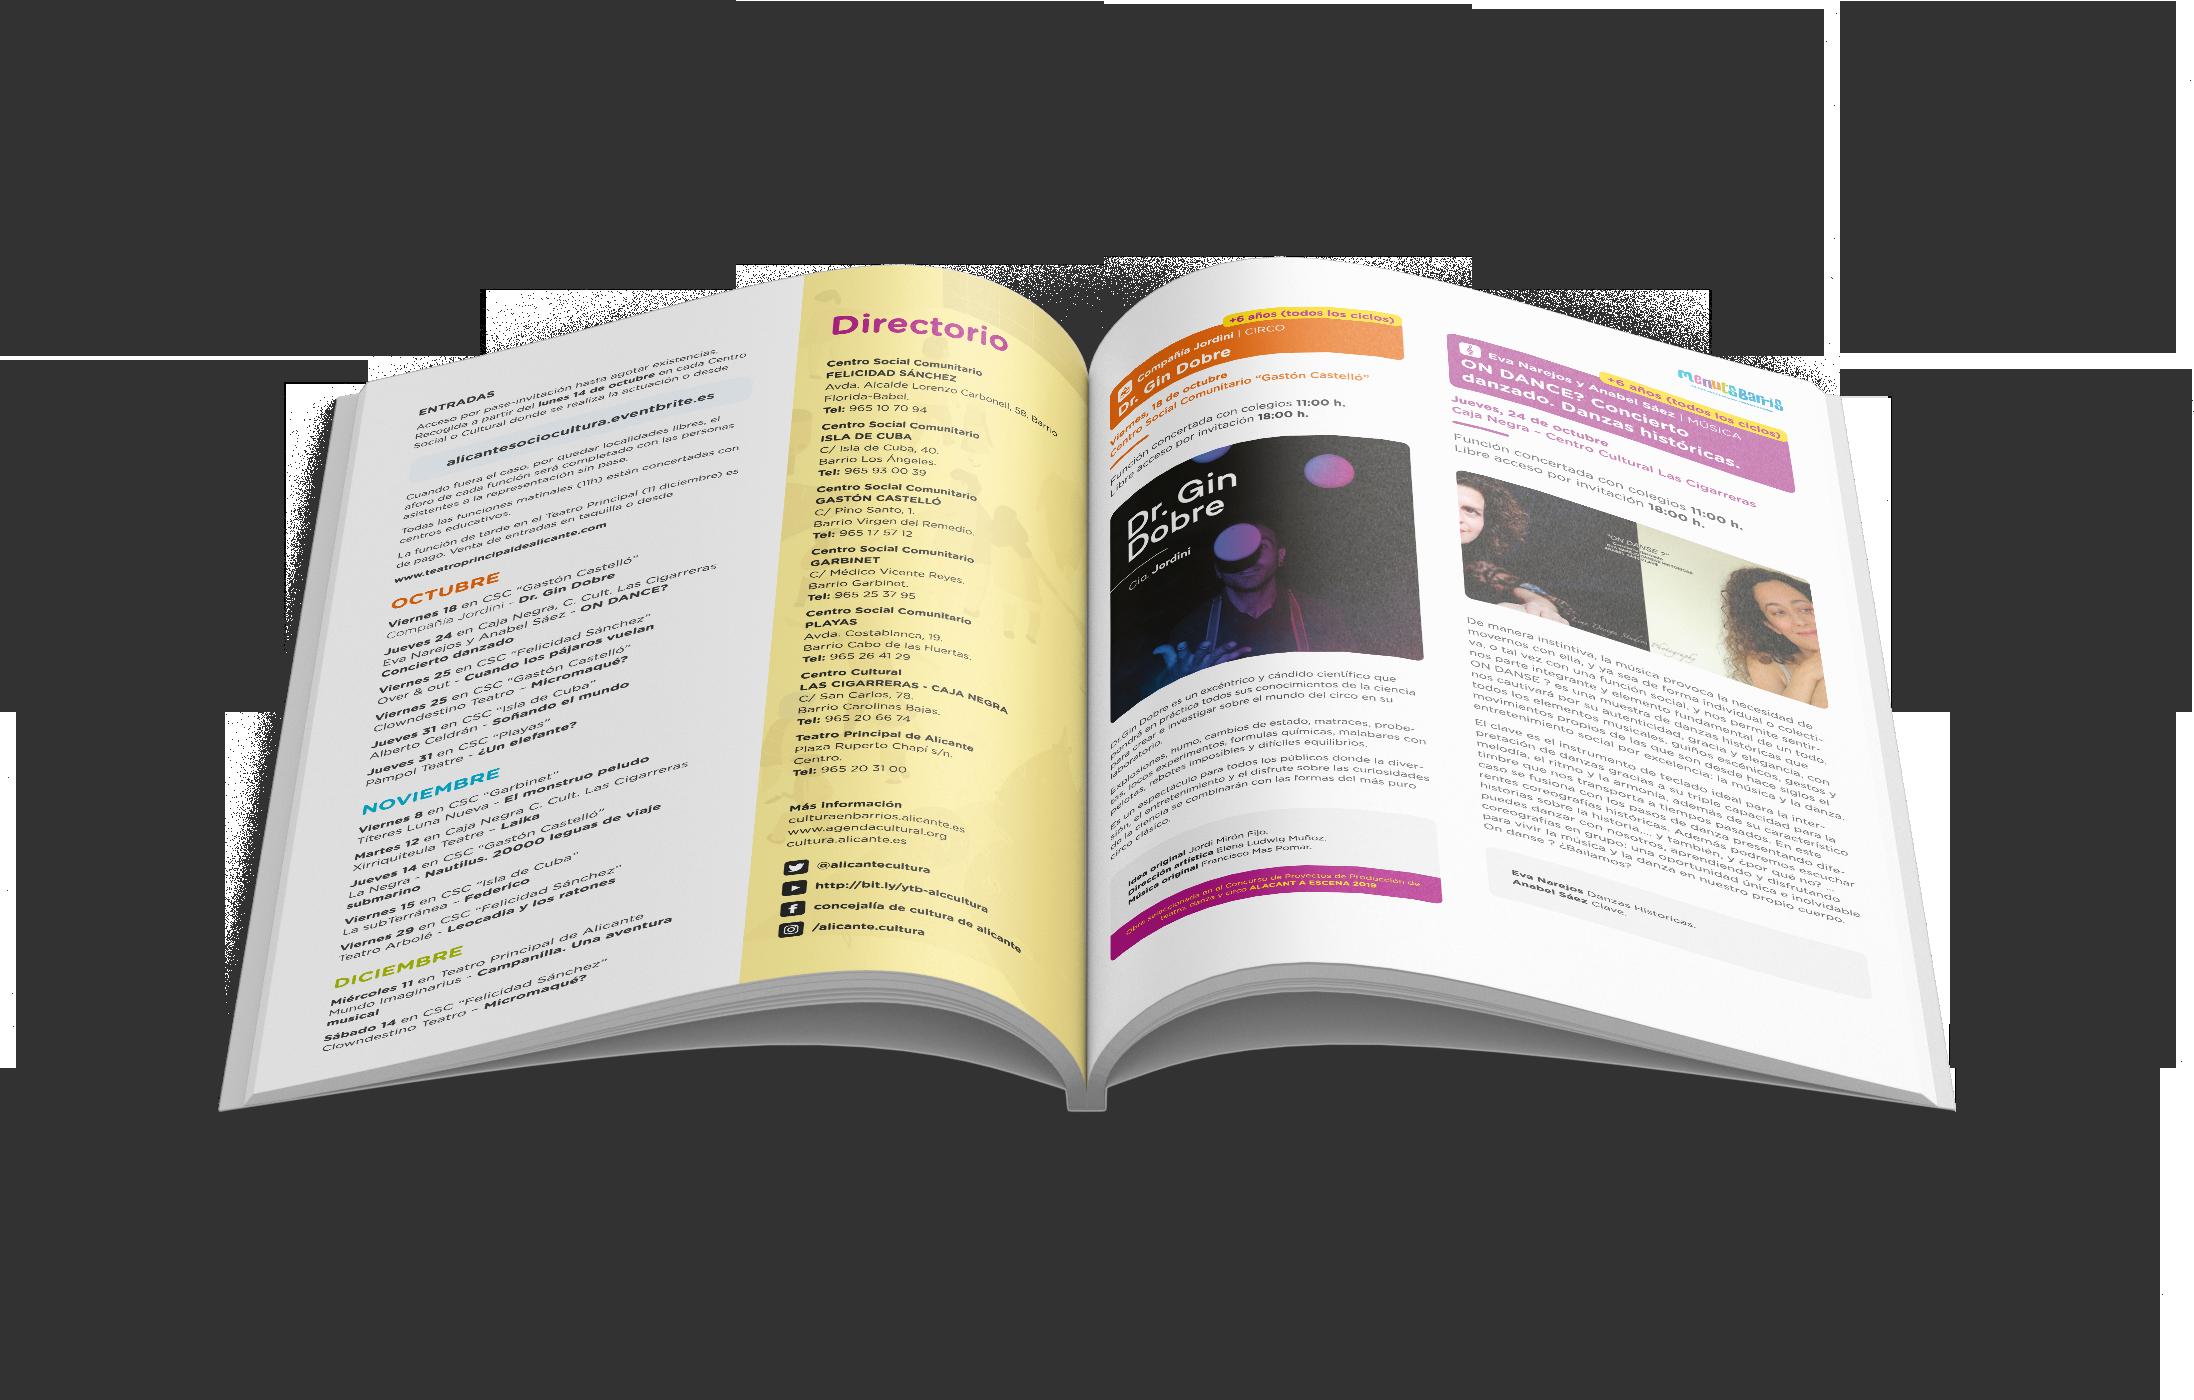 diseño grafico freelance folleto menuts barris 2019